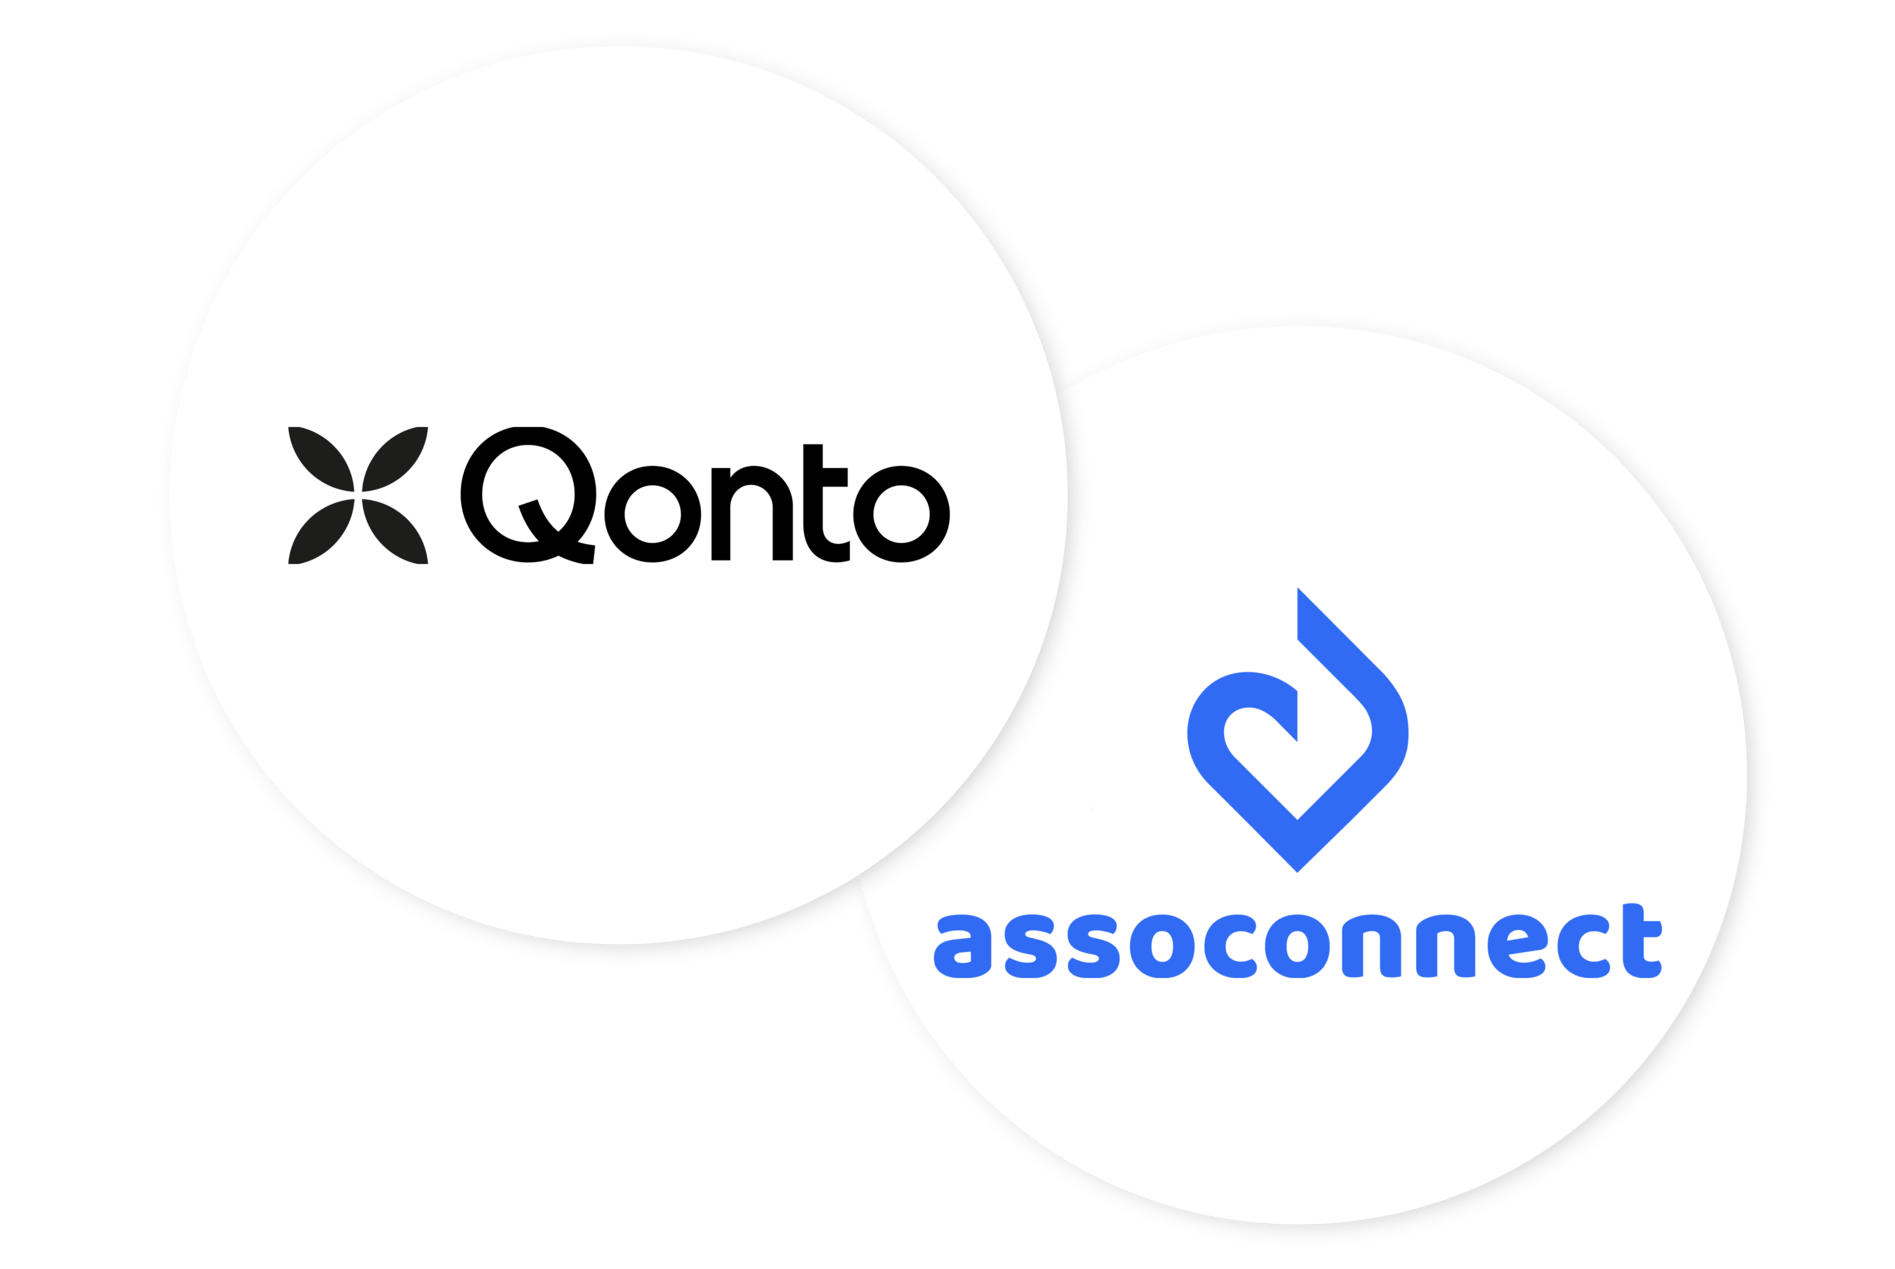 AssoConnect Qonto